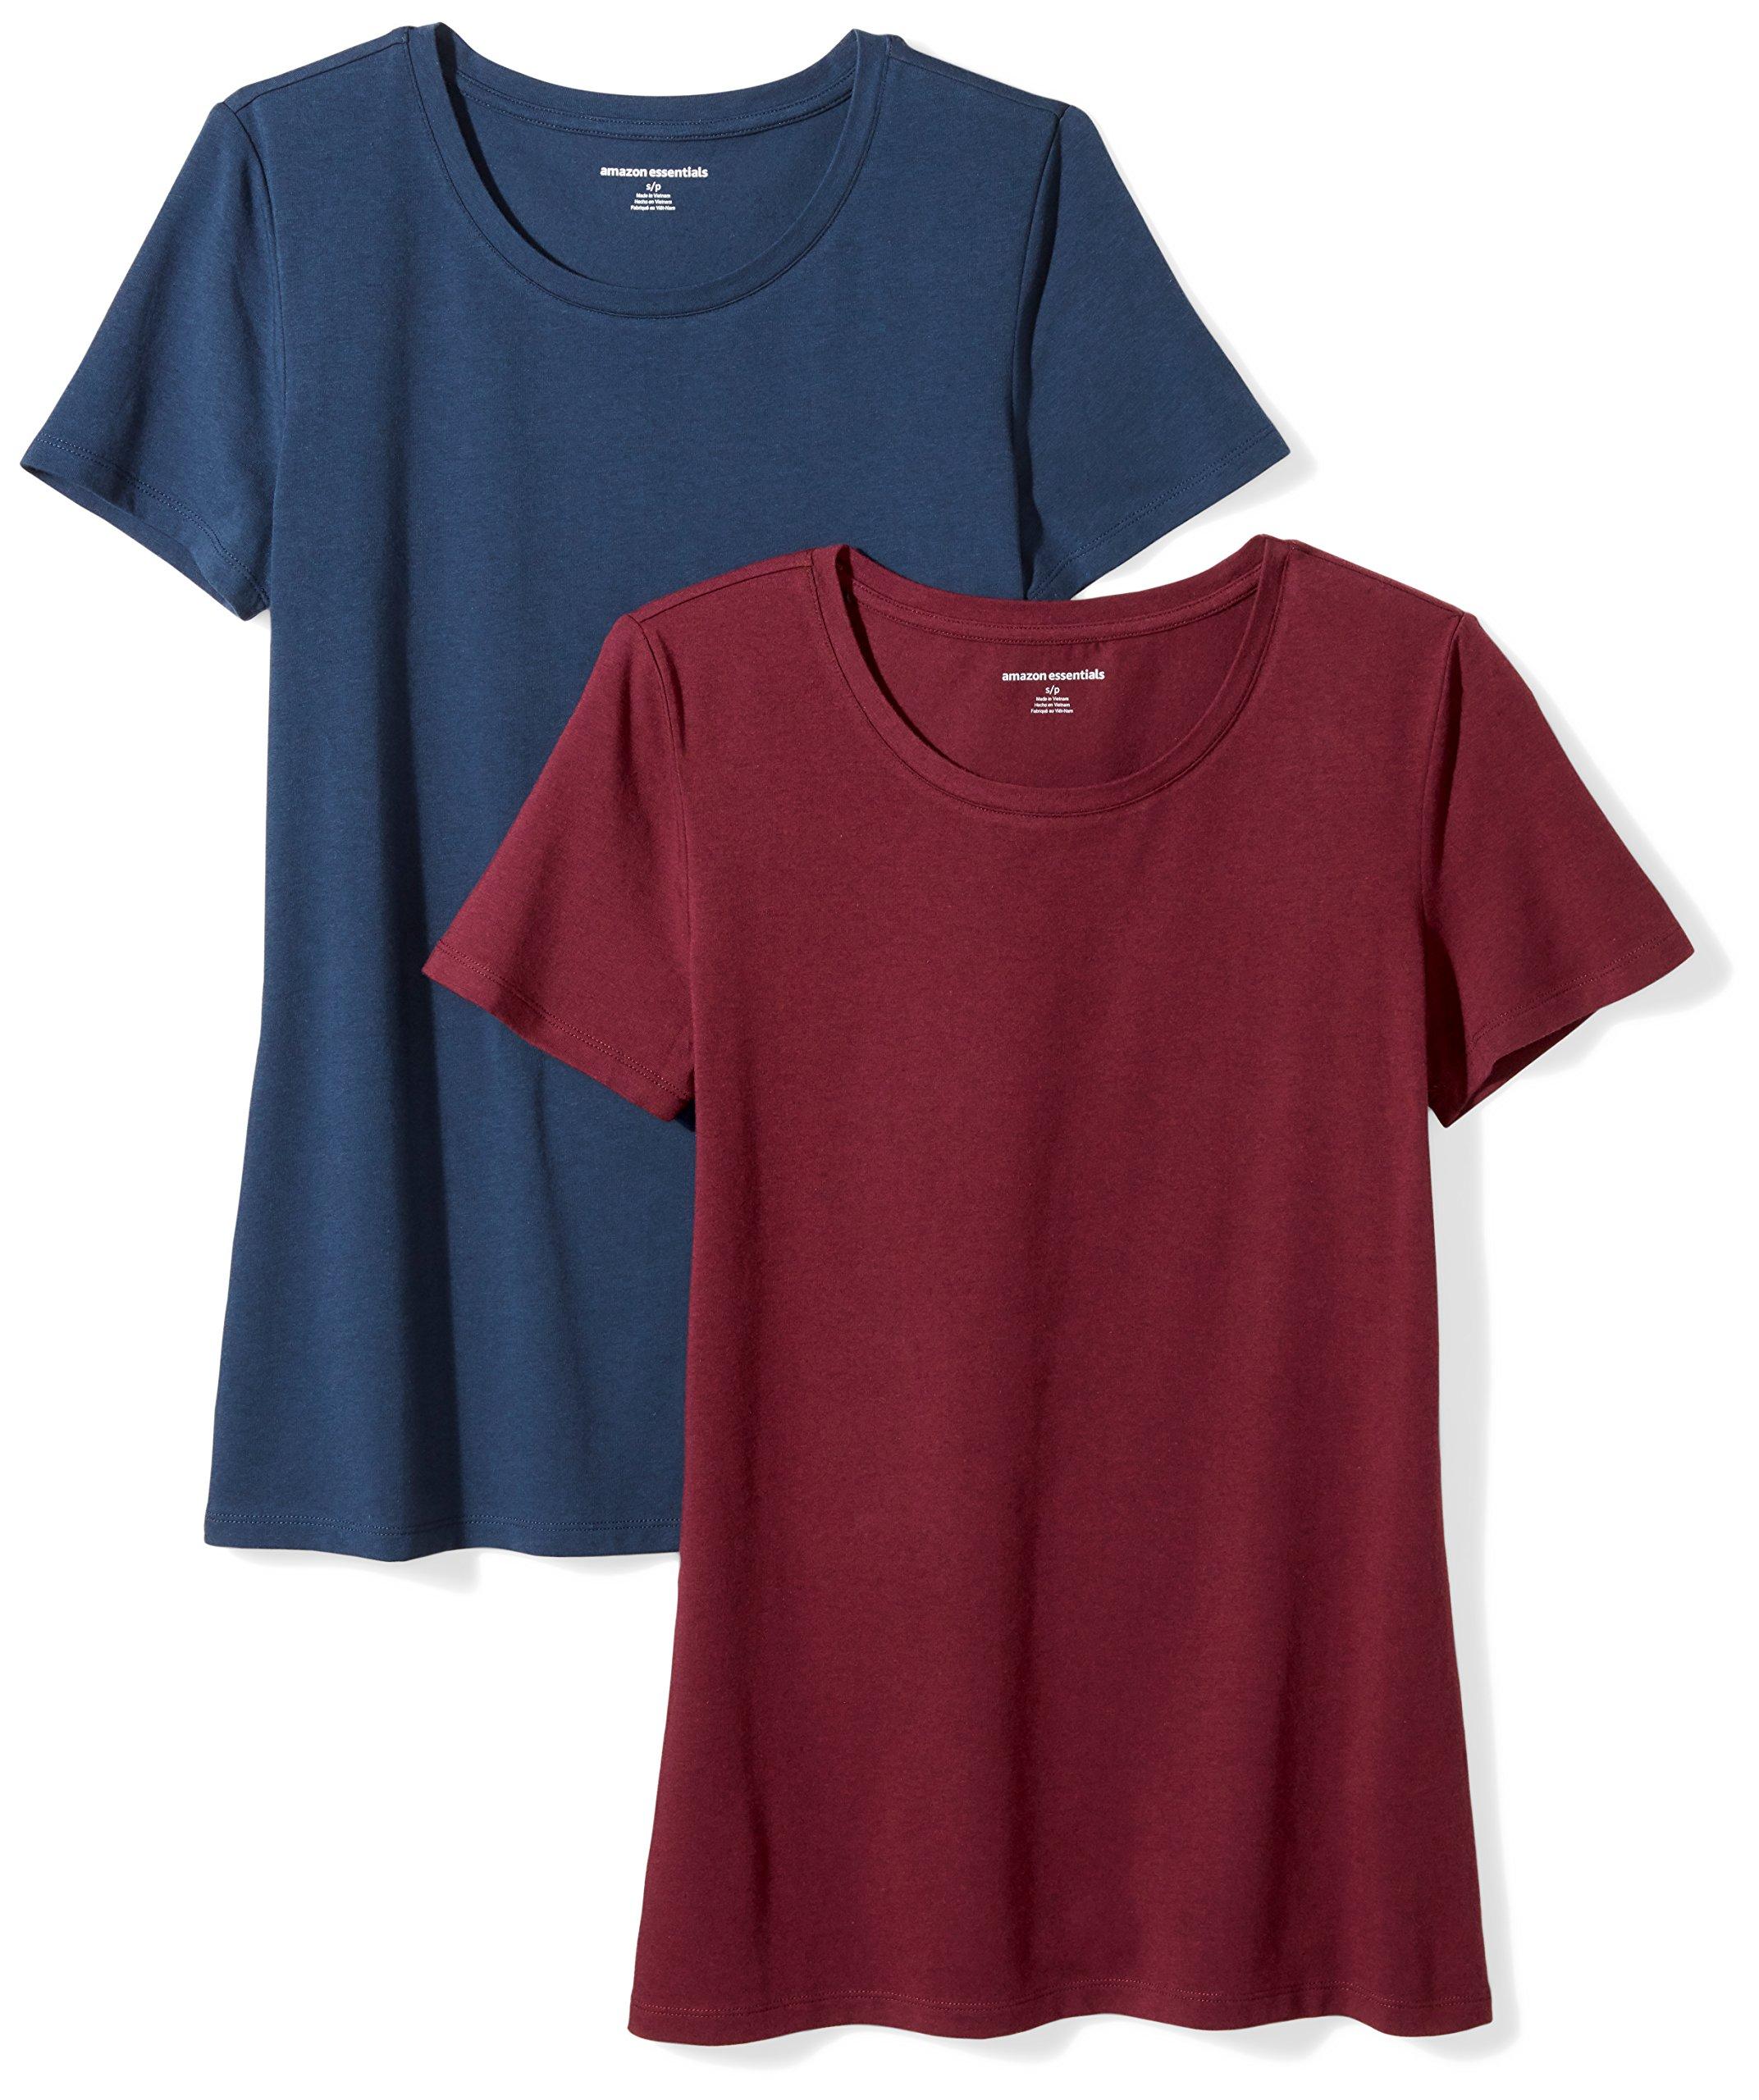 Amazon Essentials Women's 2-Pack Short-Sleeve Crewneck T-Shirt, Burgundy/Navy, X-Large